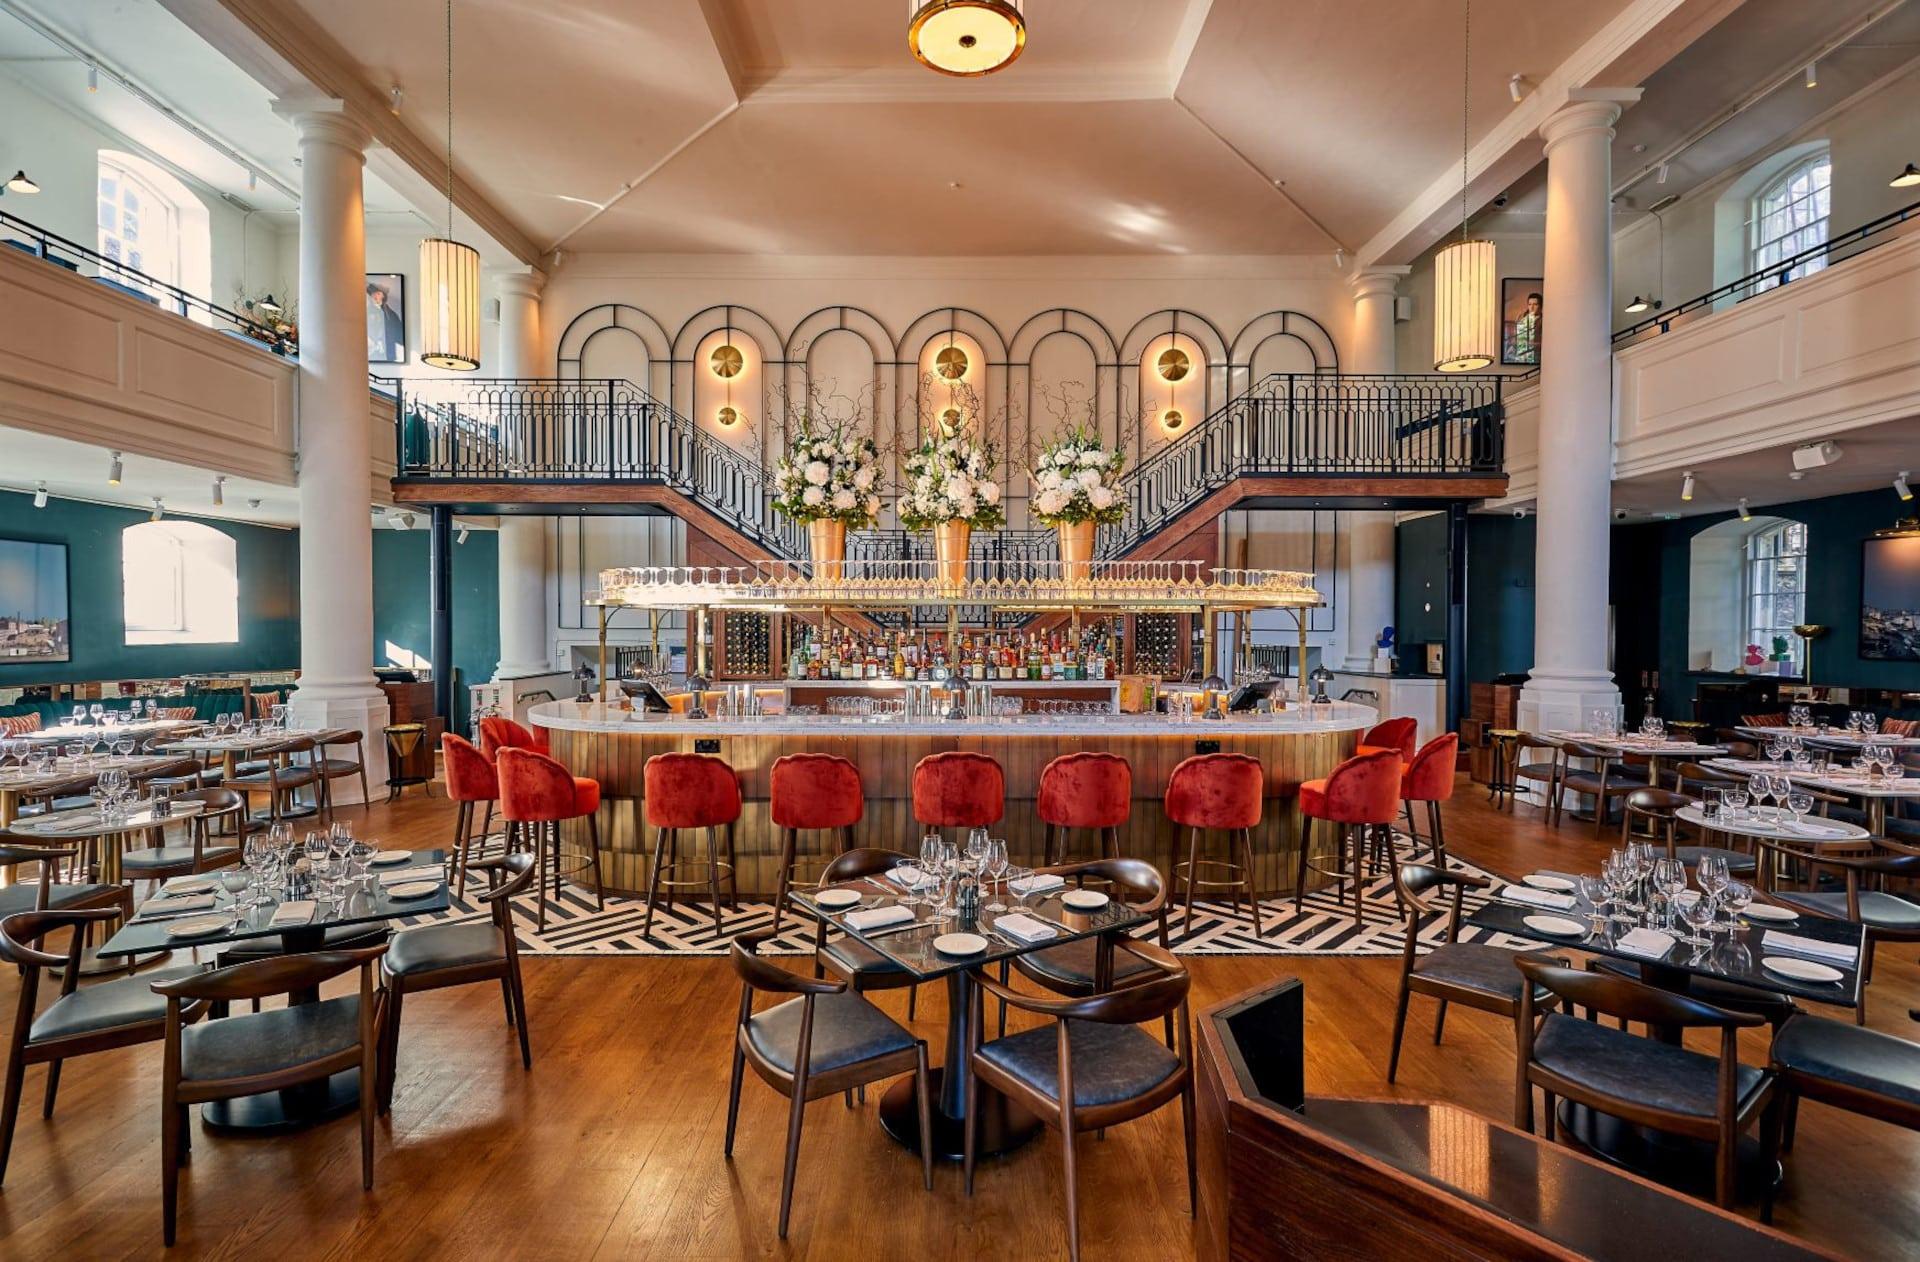 Klosterhaus Restaurant.jpg